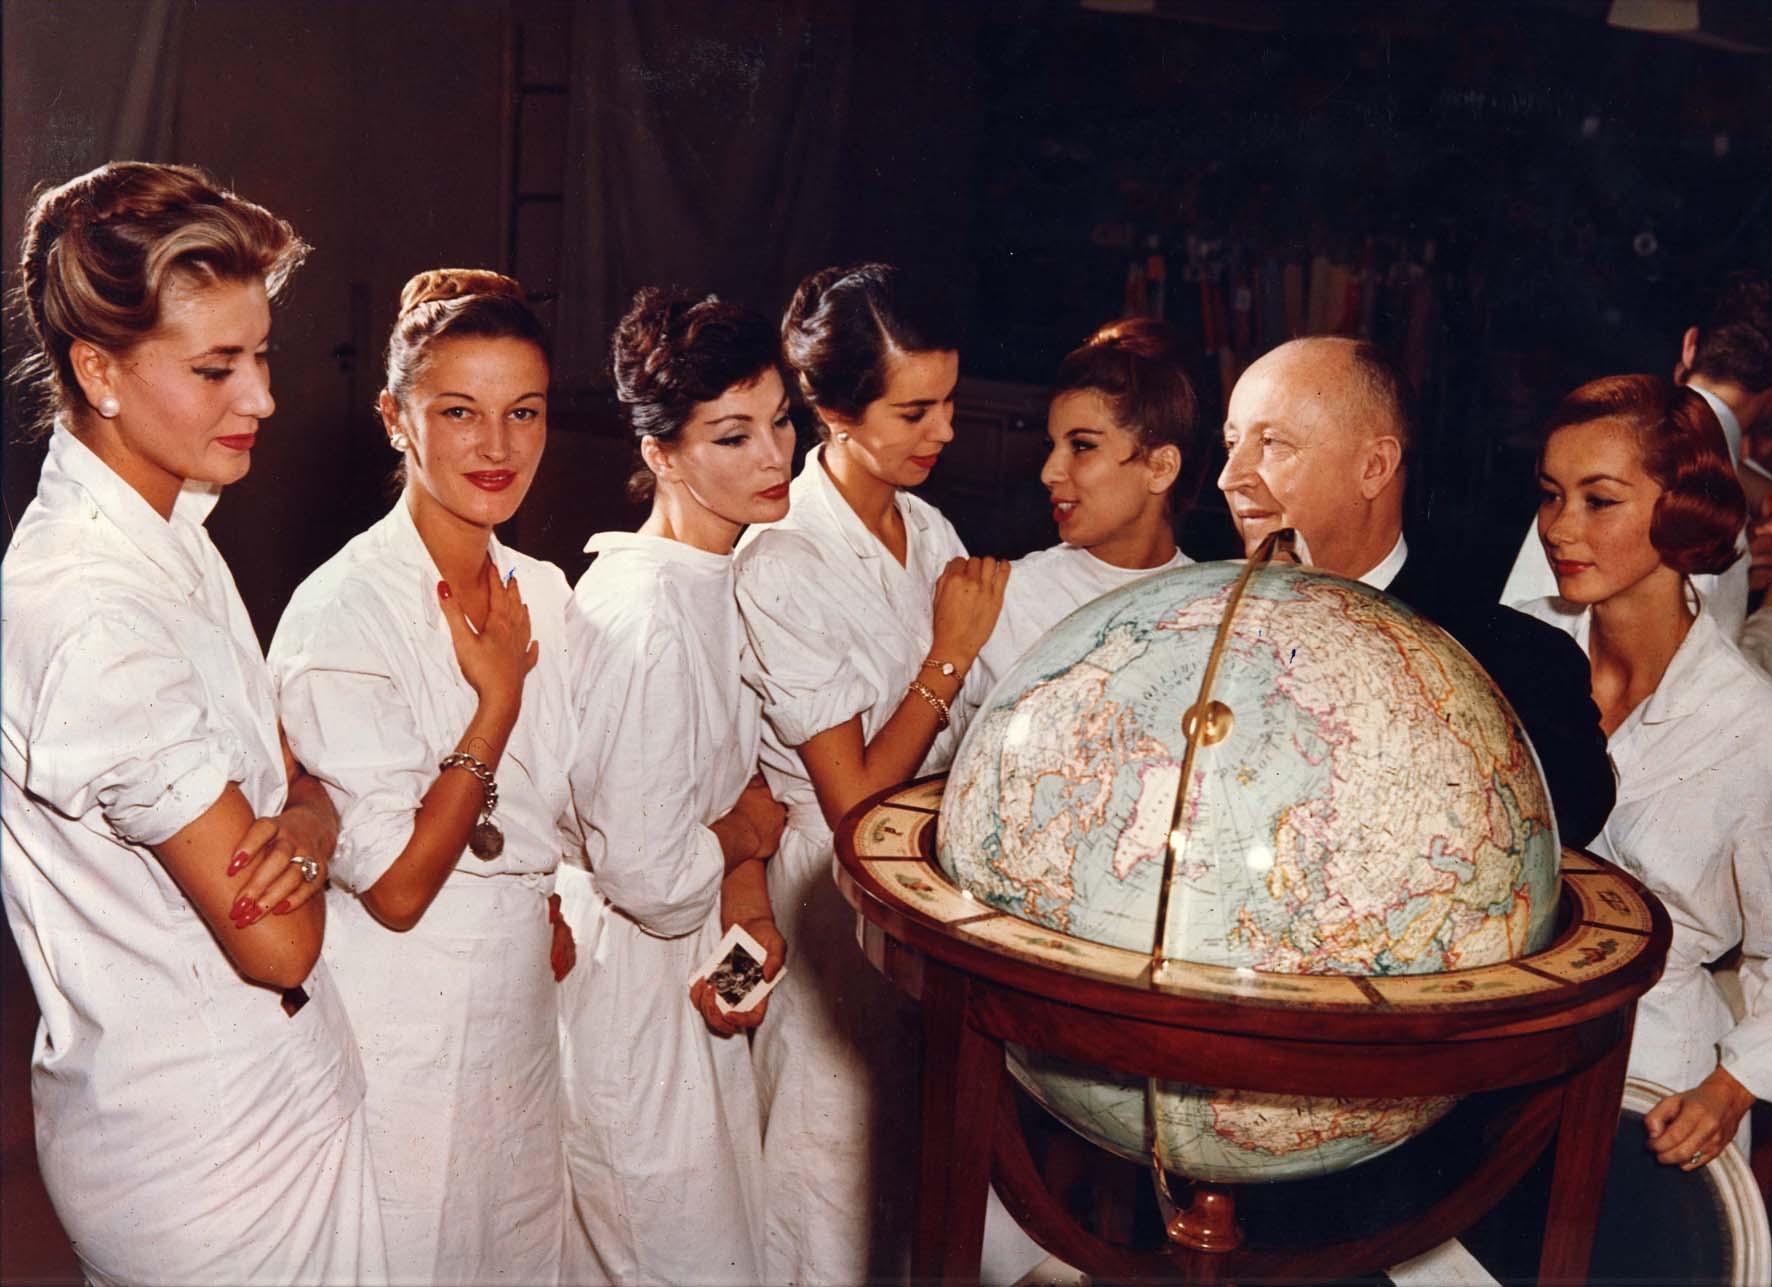 Christian Dior with models, about 1955. Photo André Gandner. © Clémence Gandner